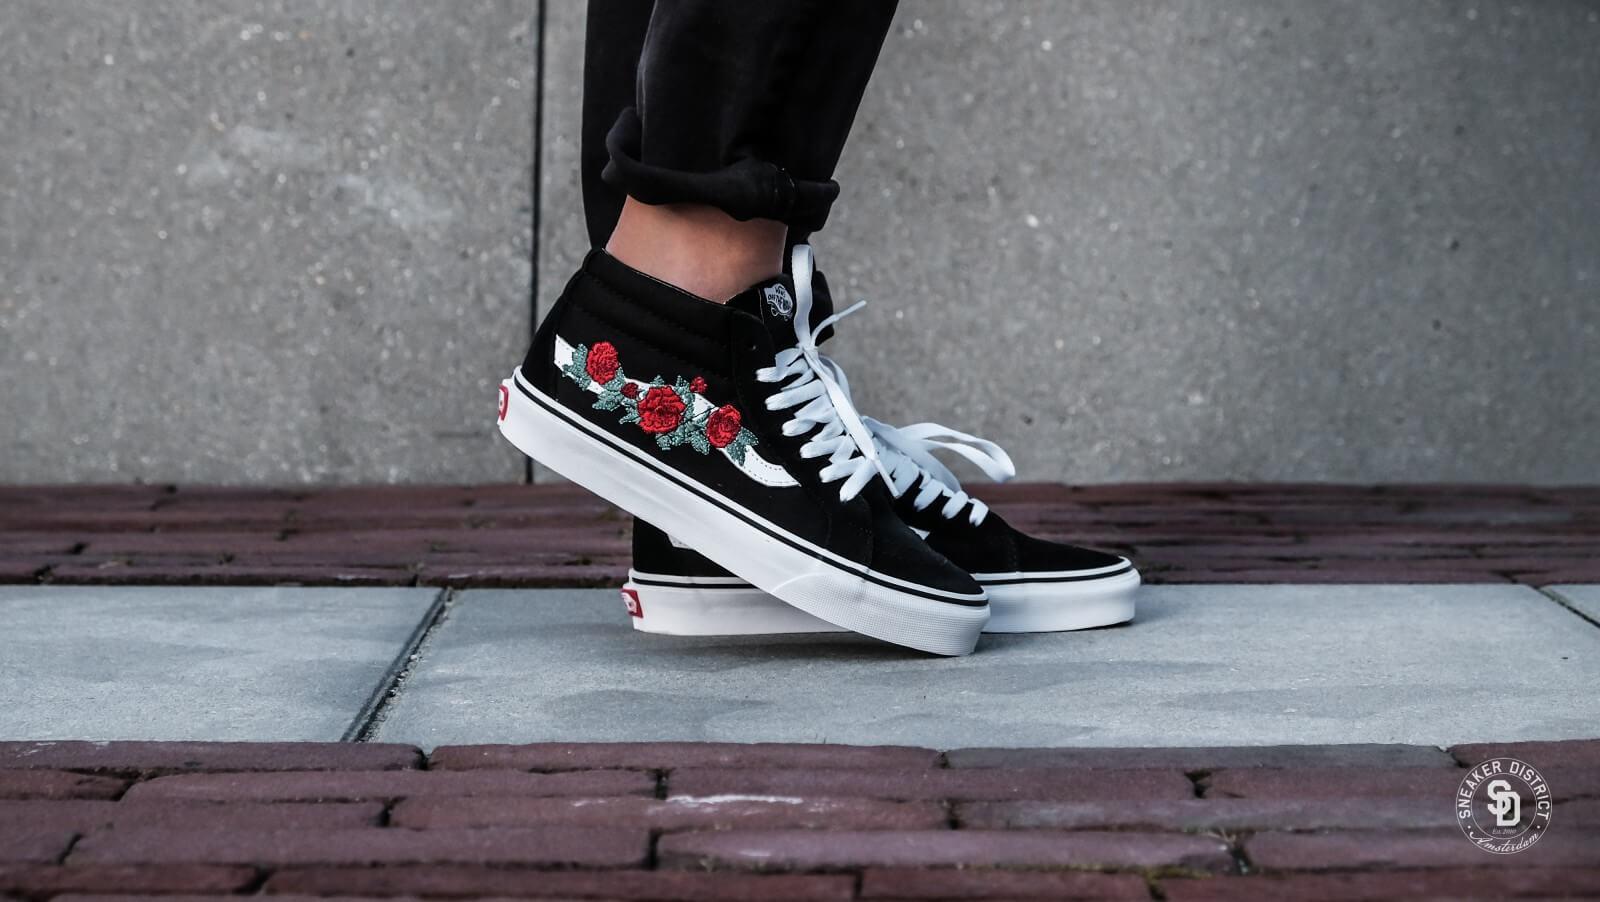 Vans Rose Thorns Old Skool Shoes Flash Sales, UP TO 58% OFF